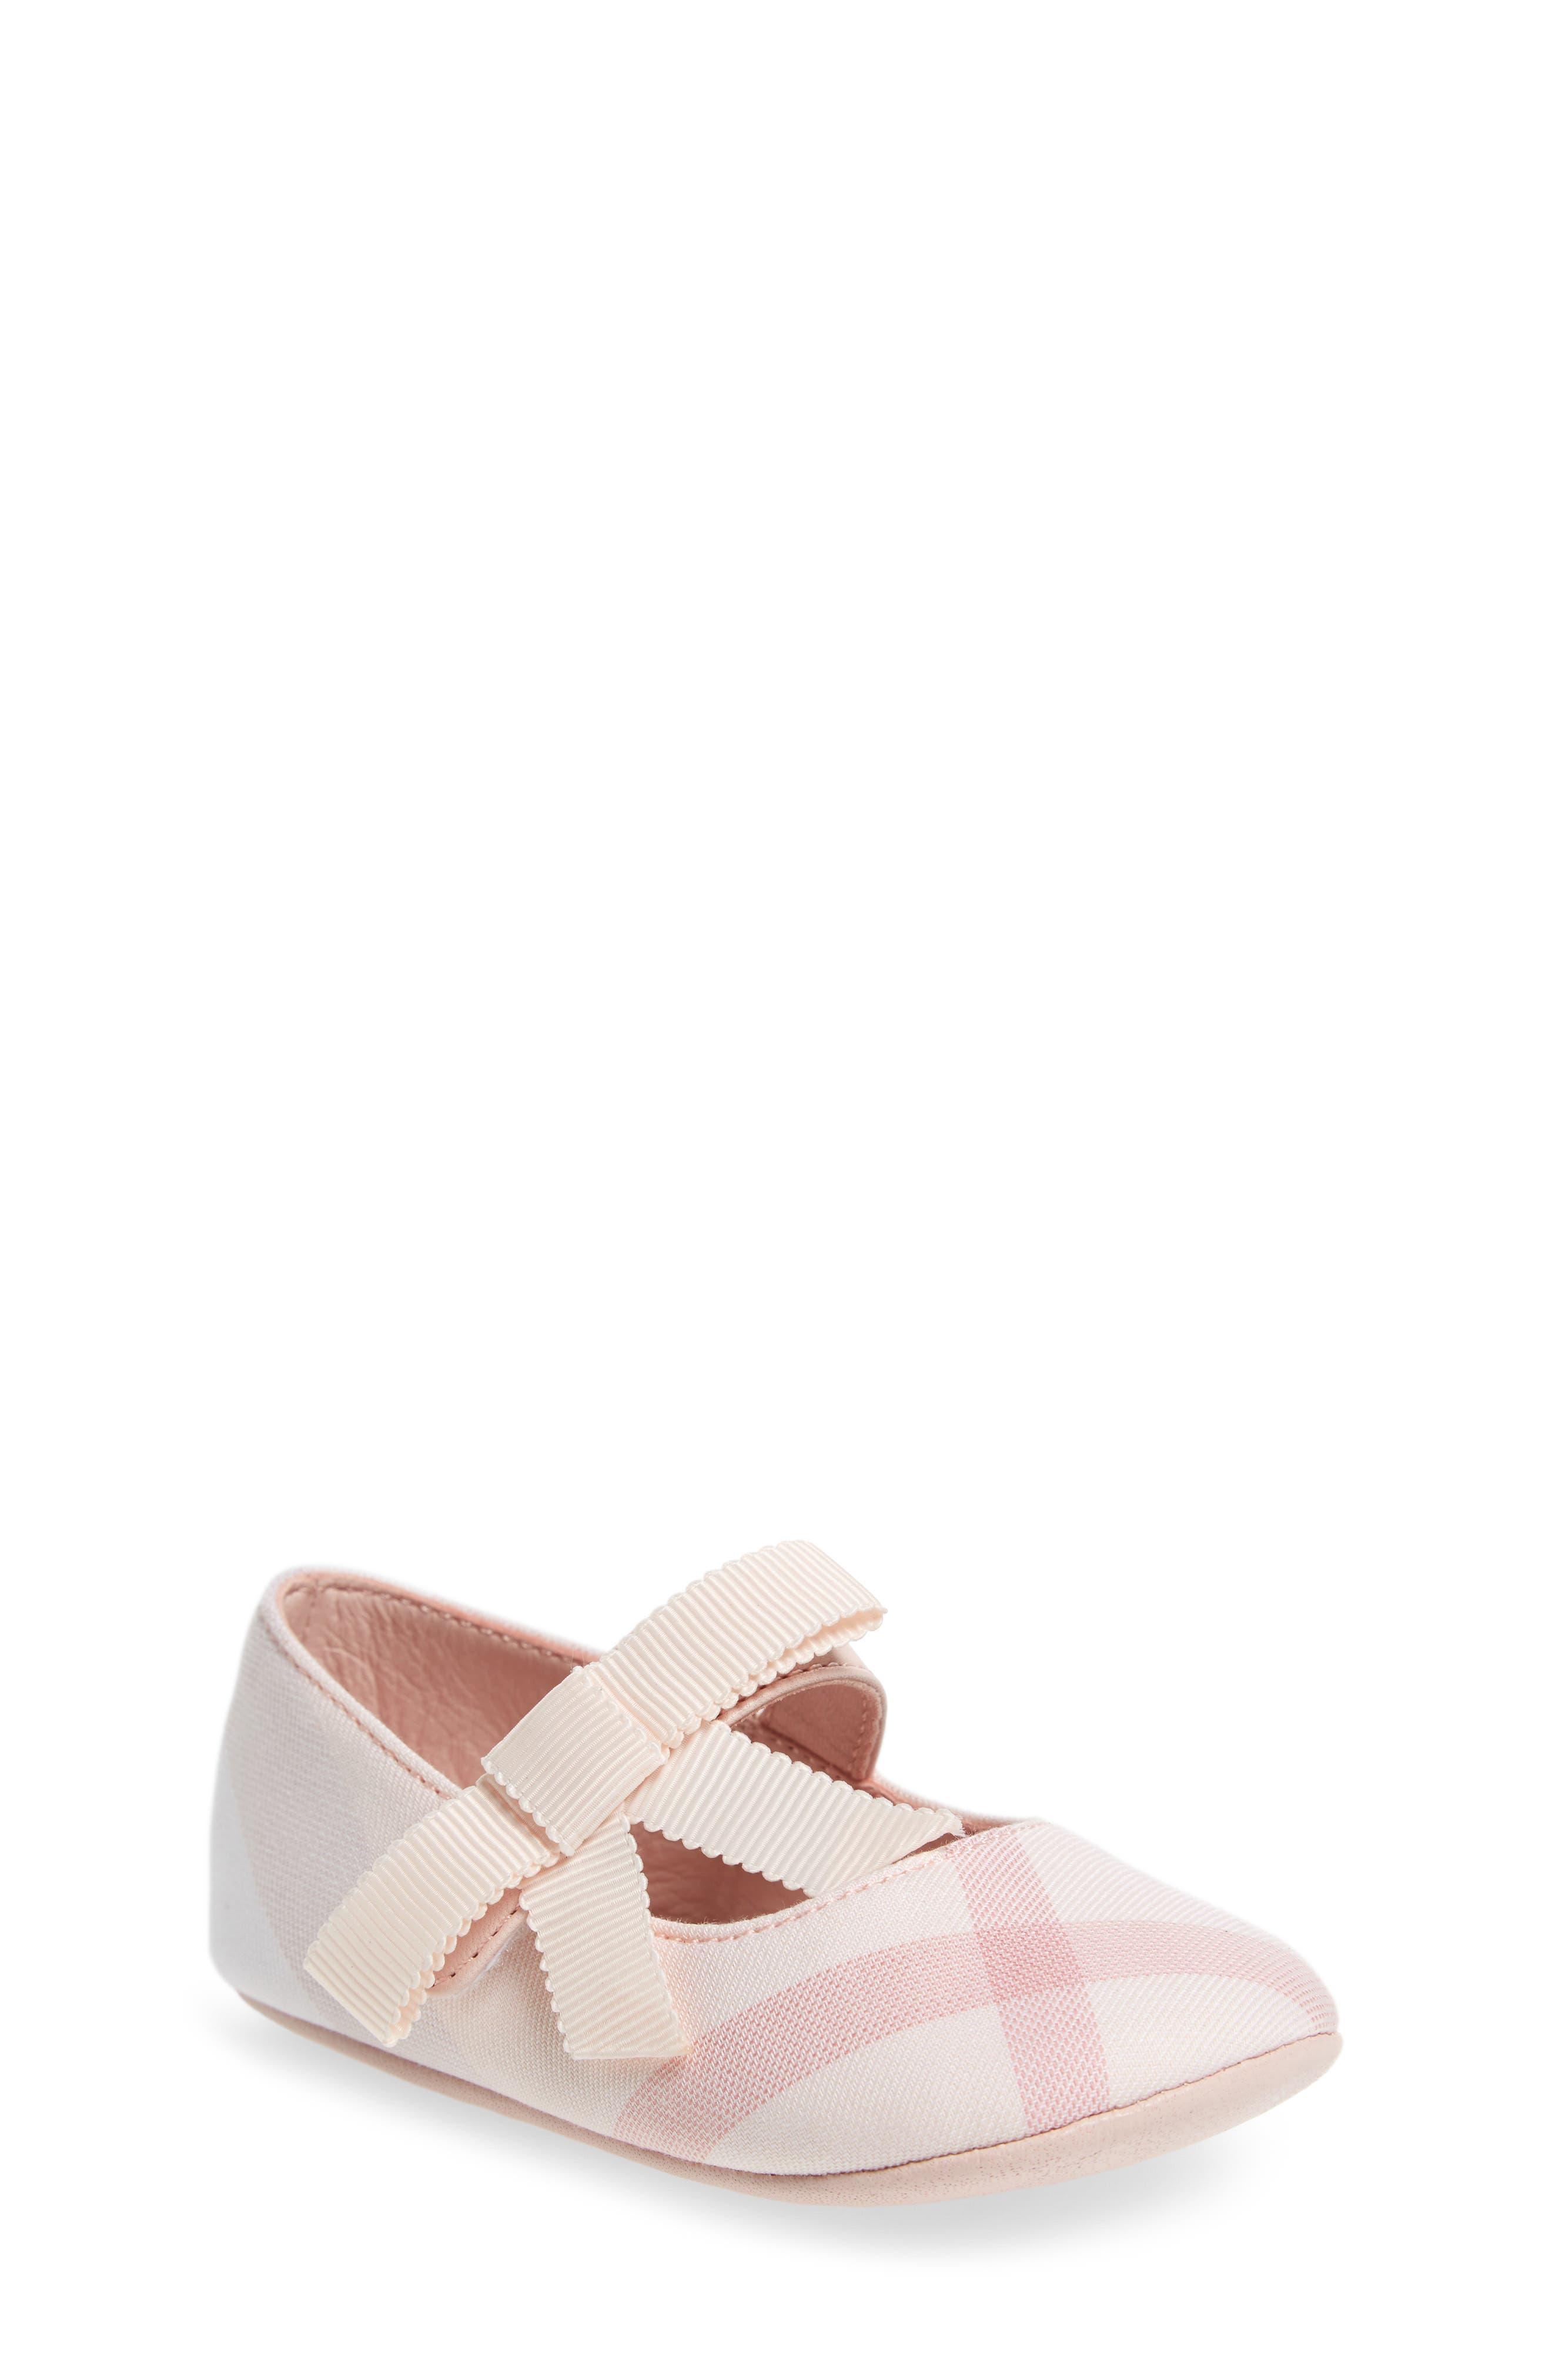 Alternate Image 1 Selected - Burberry Stark Mary Jane Crib Shoe (Baby)